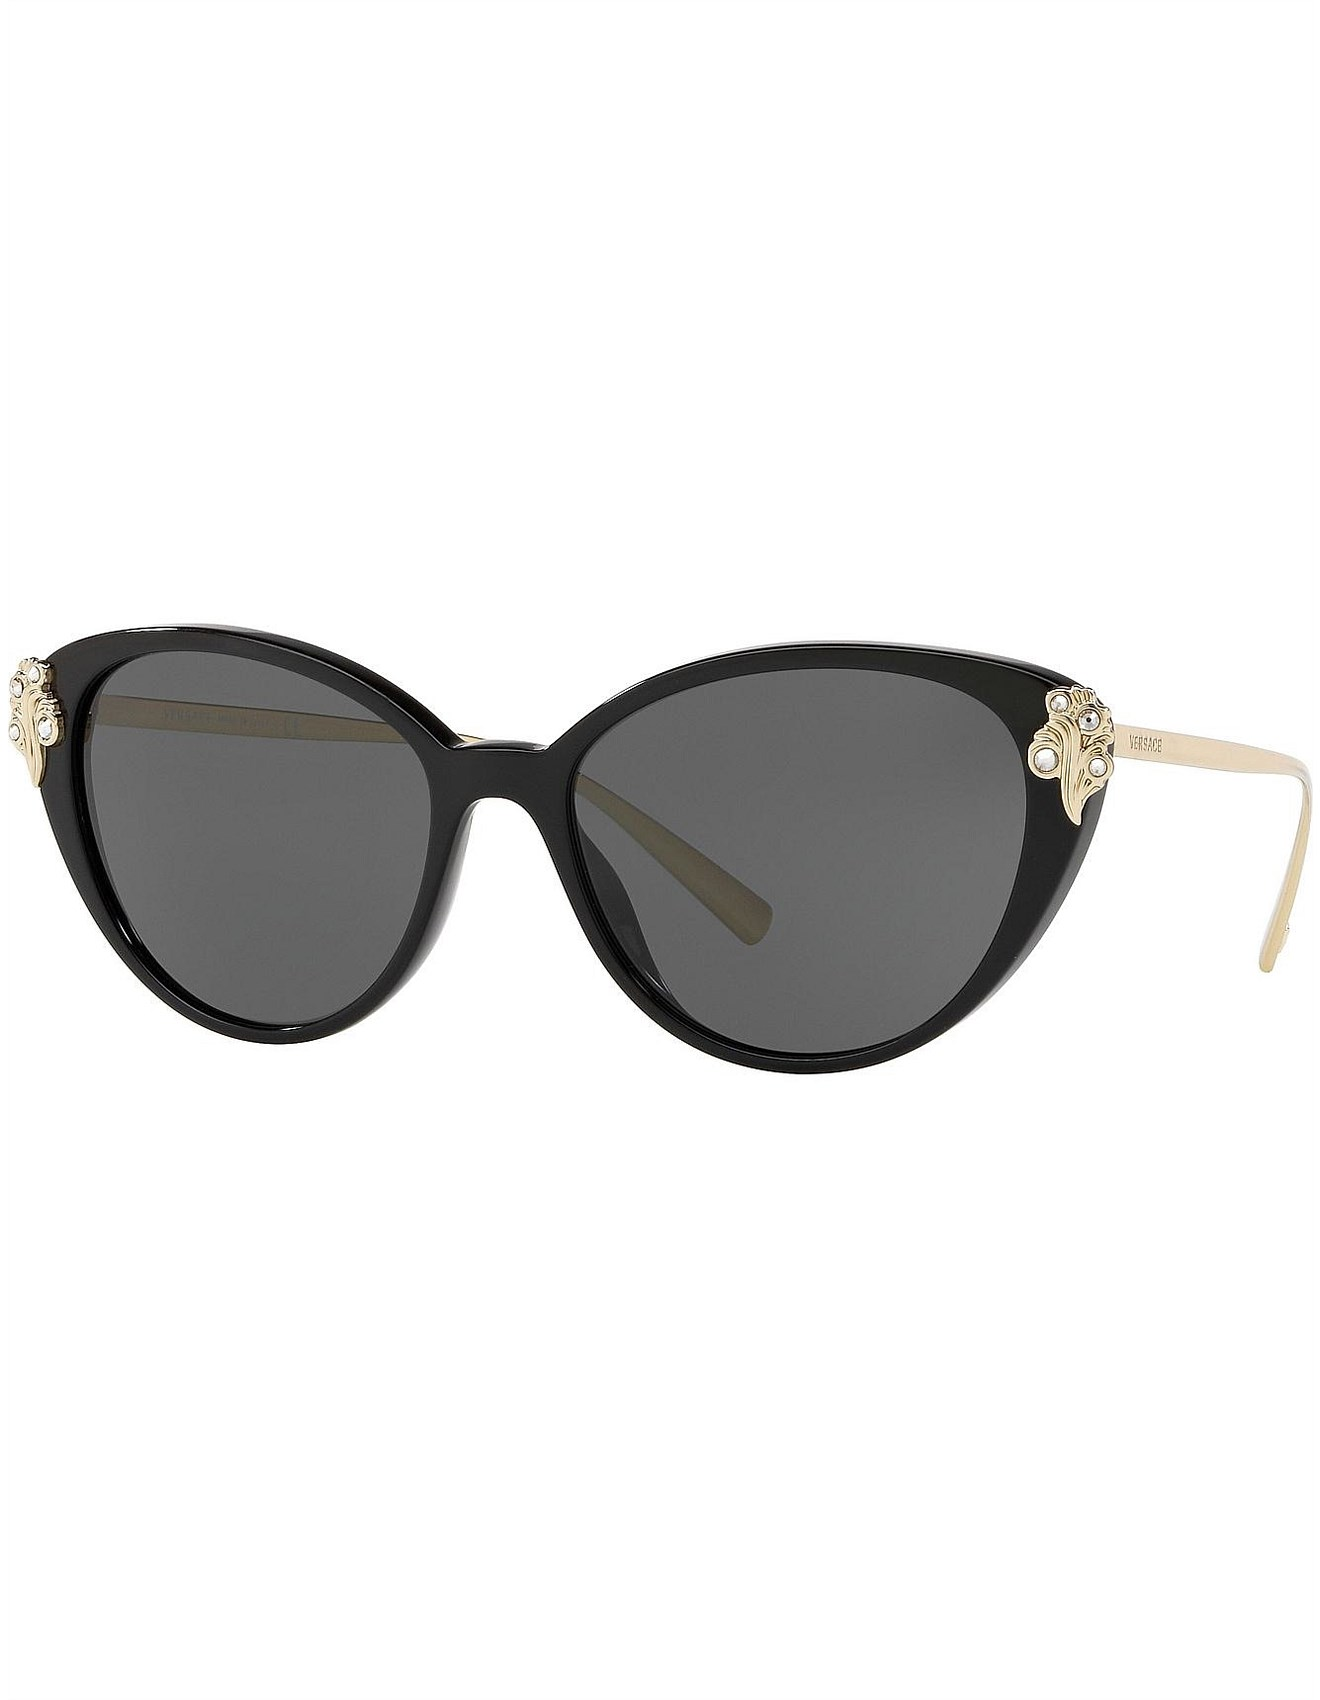 7191bccad619 Women s Cateye Sunglasses